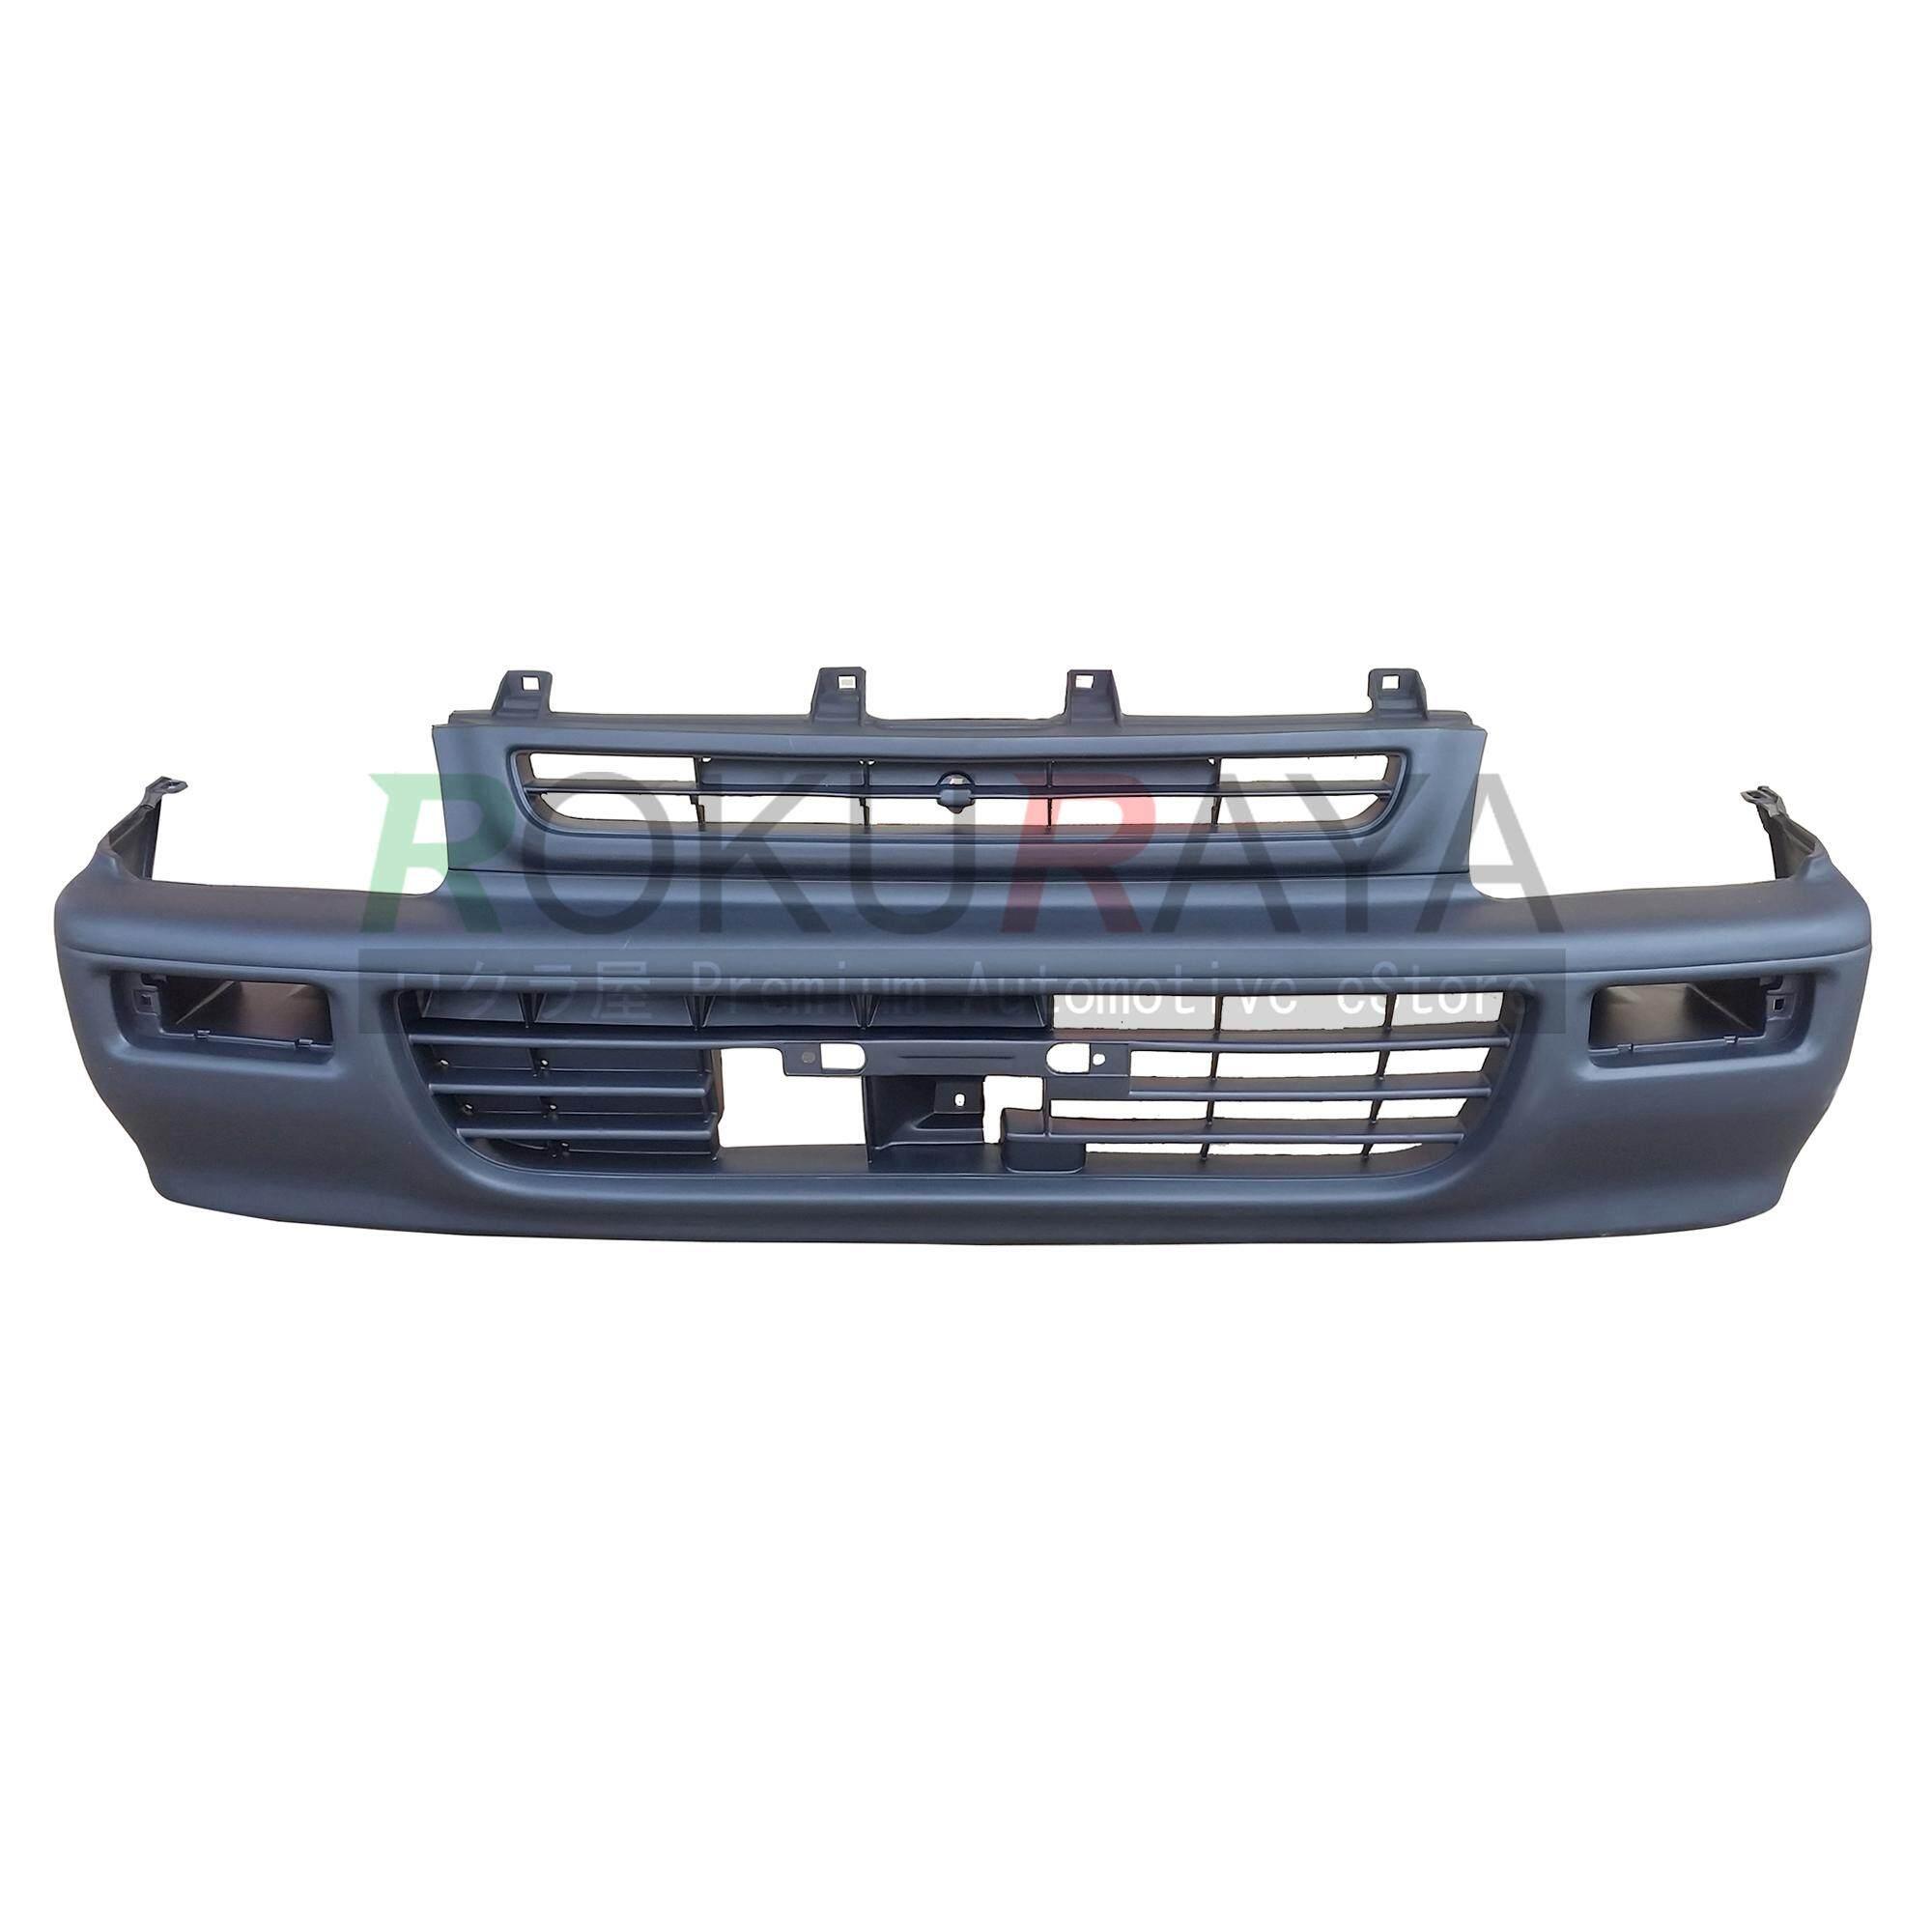 Perodua Kancil Old Square Head Lamp (1994 Model 660) Oem Standard Front Bumper Polypropylene Pp Plastic Body Part Oem Replacement Spare Part - Black By Automart Rr.